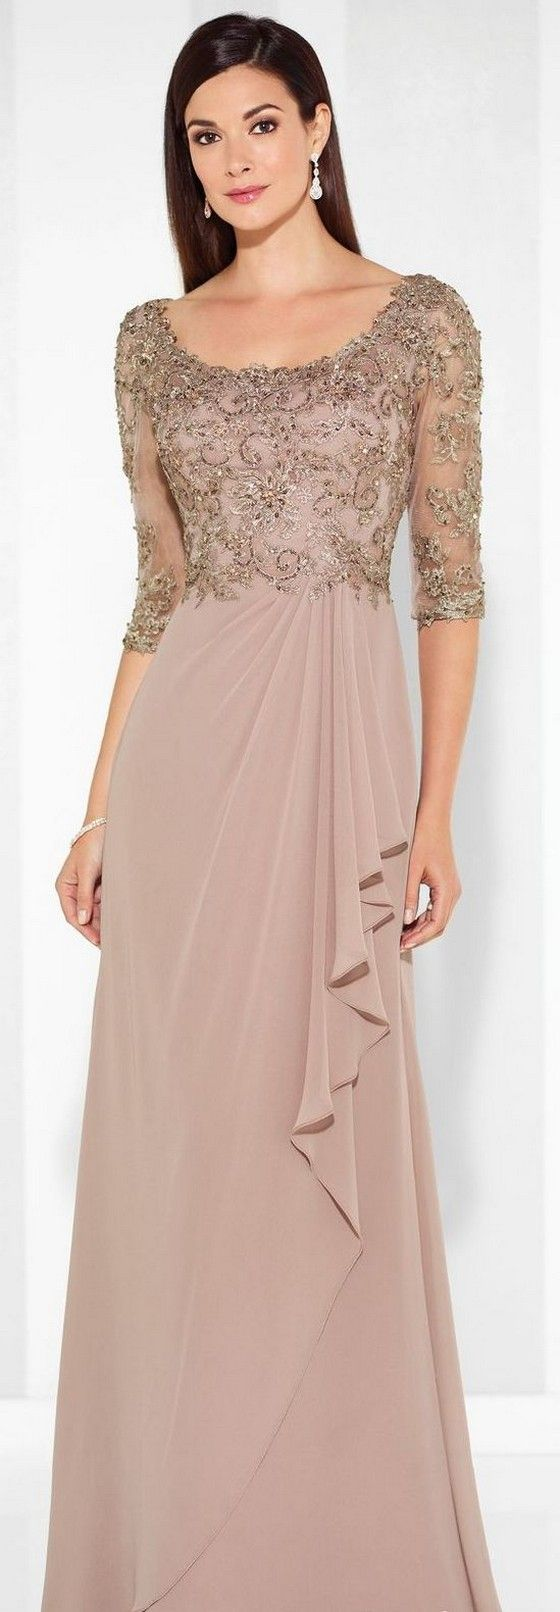 Best Evening Dresses Elegant High 60+Ideas | Vestidos bellos ...